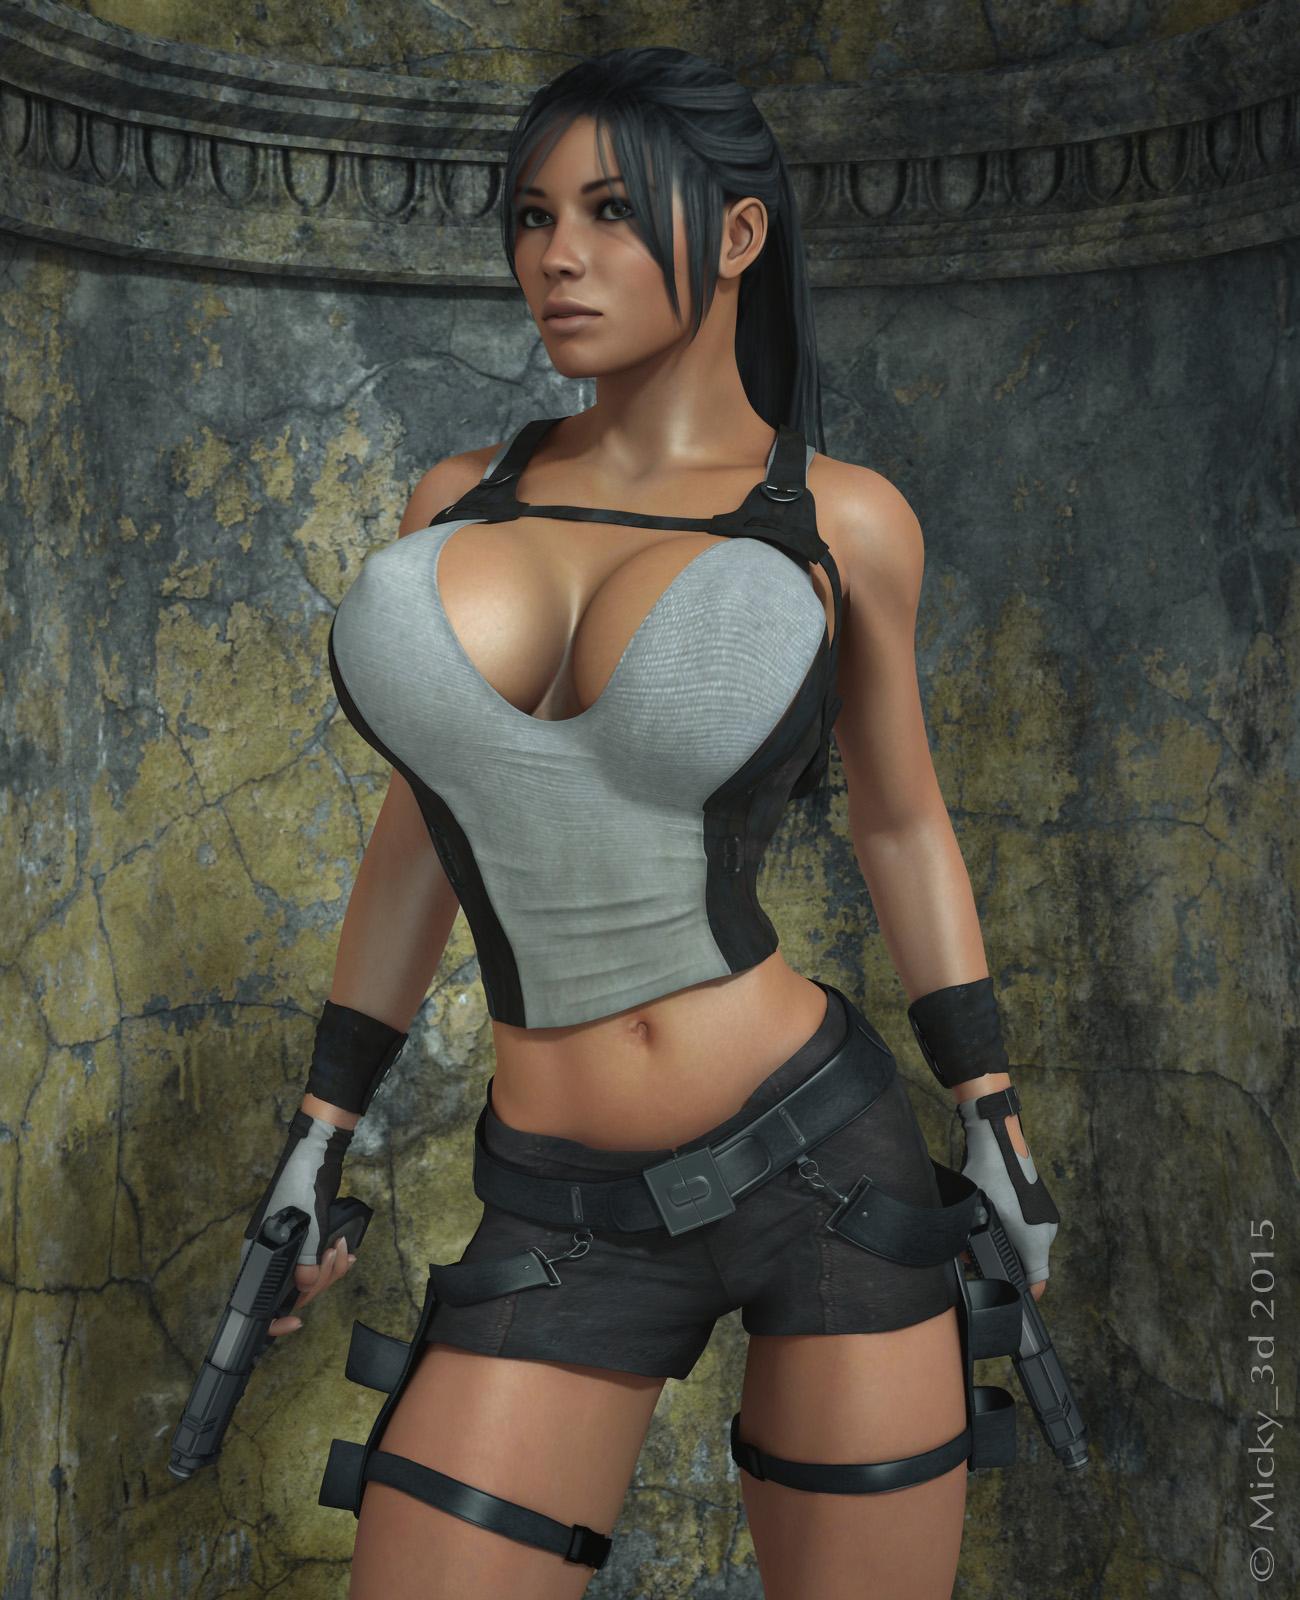 Lady croft 3d erotica image